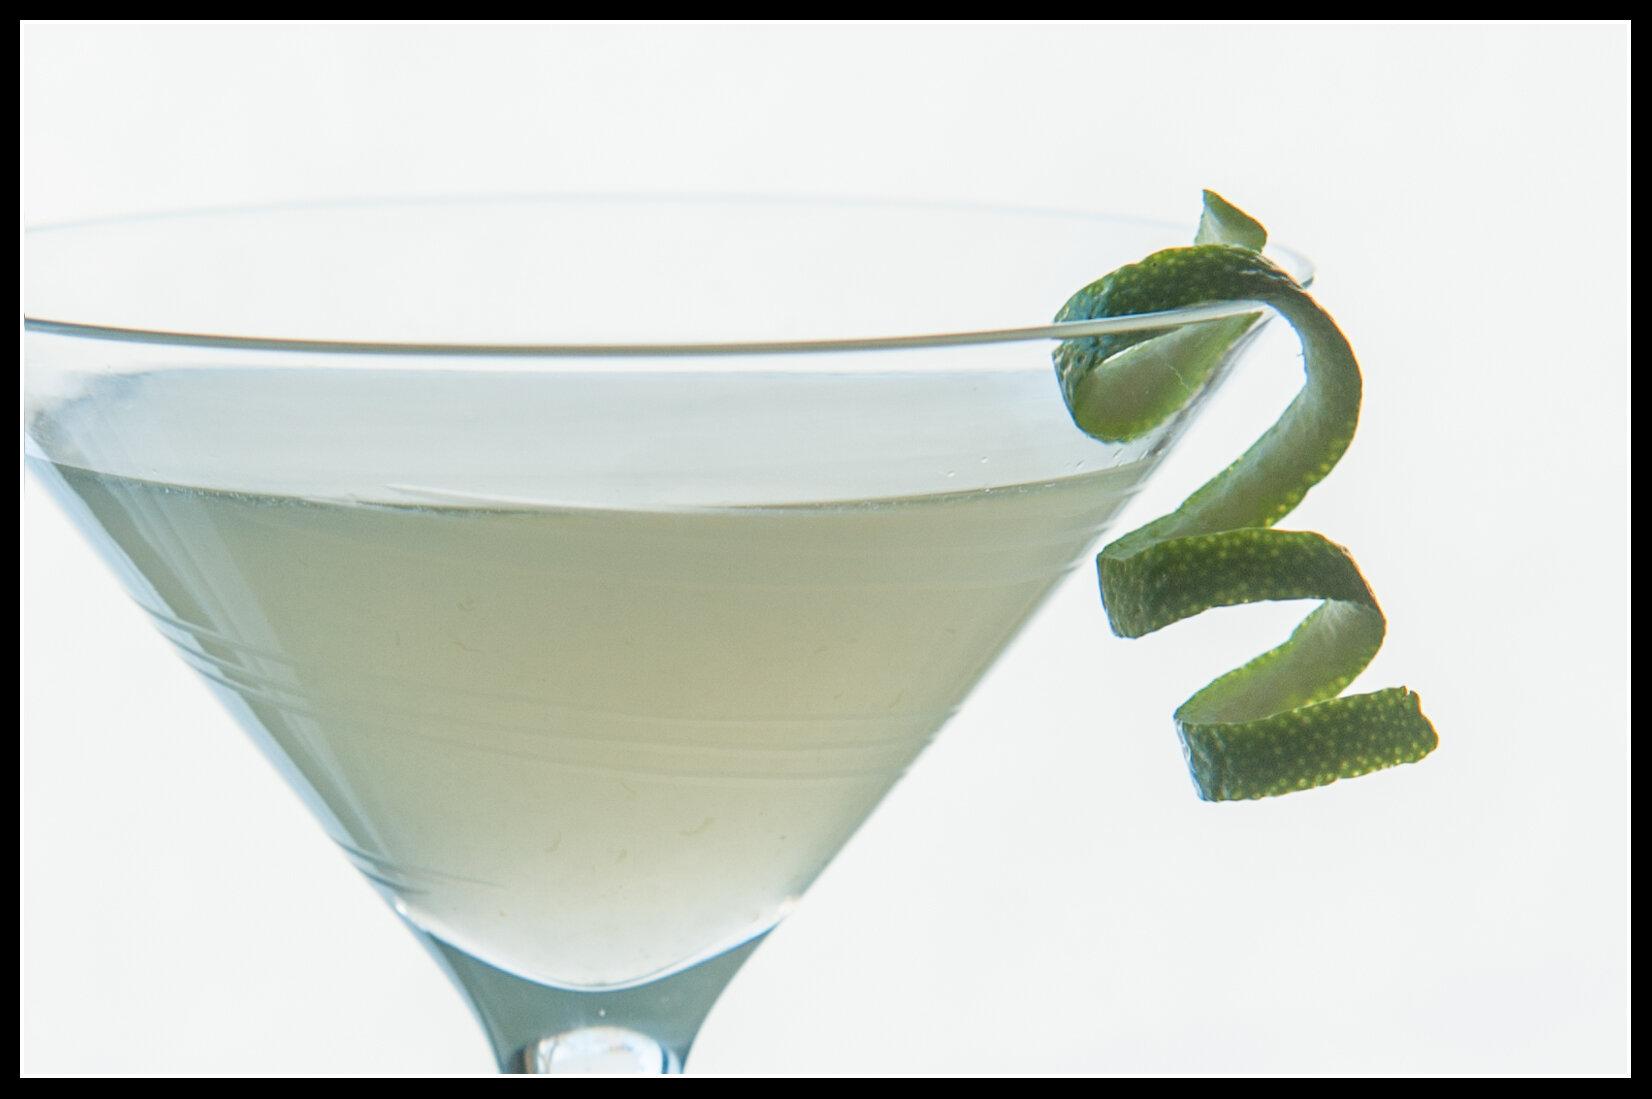 KAMIKAZE cocktail - 1.5 oz Glacial Lakes Vodka 1.5 oz Fresh lime Juice1.5 oz Triple SecShakeServe in chilled martini glassGarnish lime twist